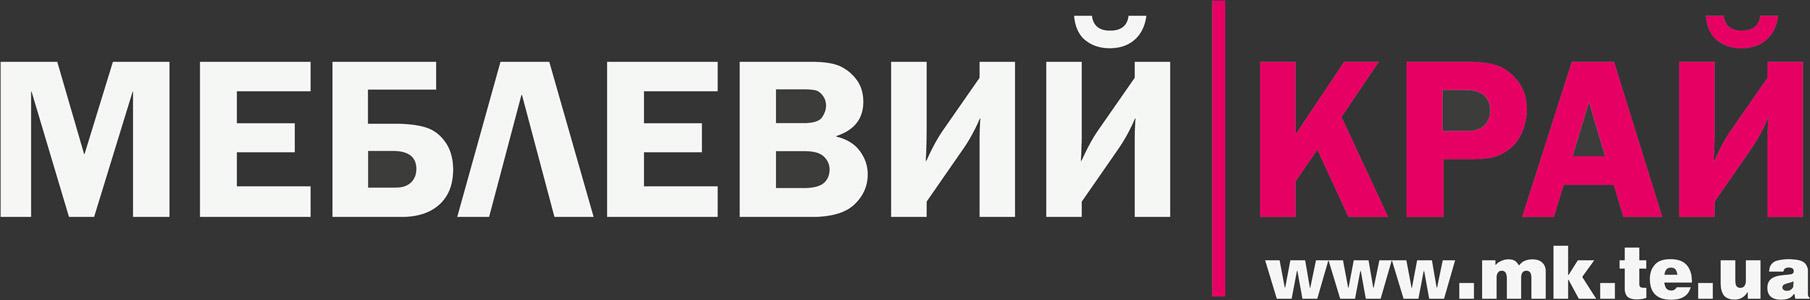 "Компания ""Меблевий край"""